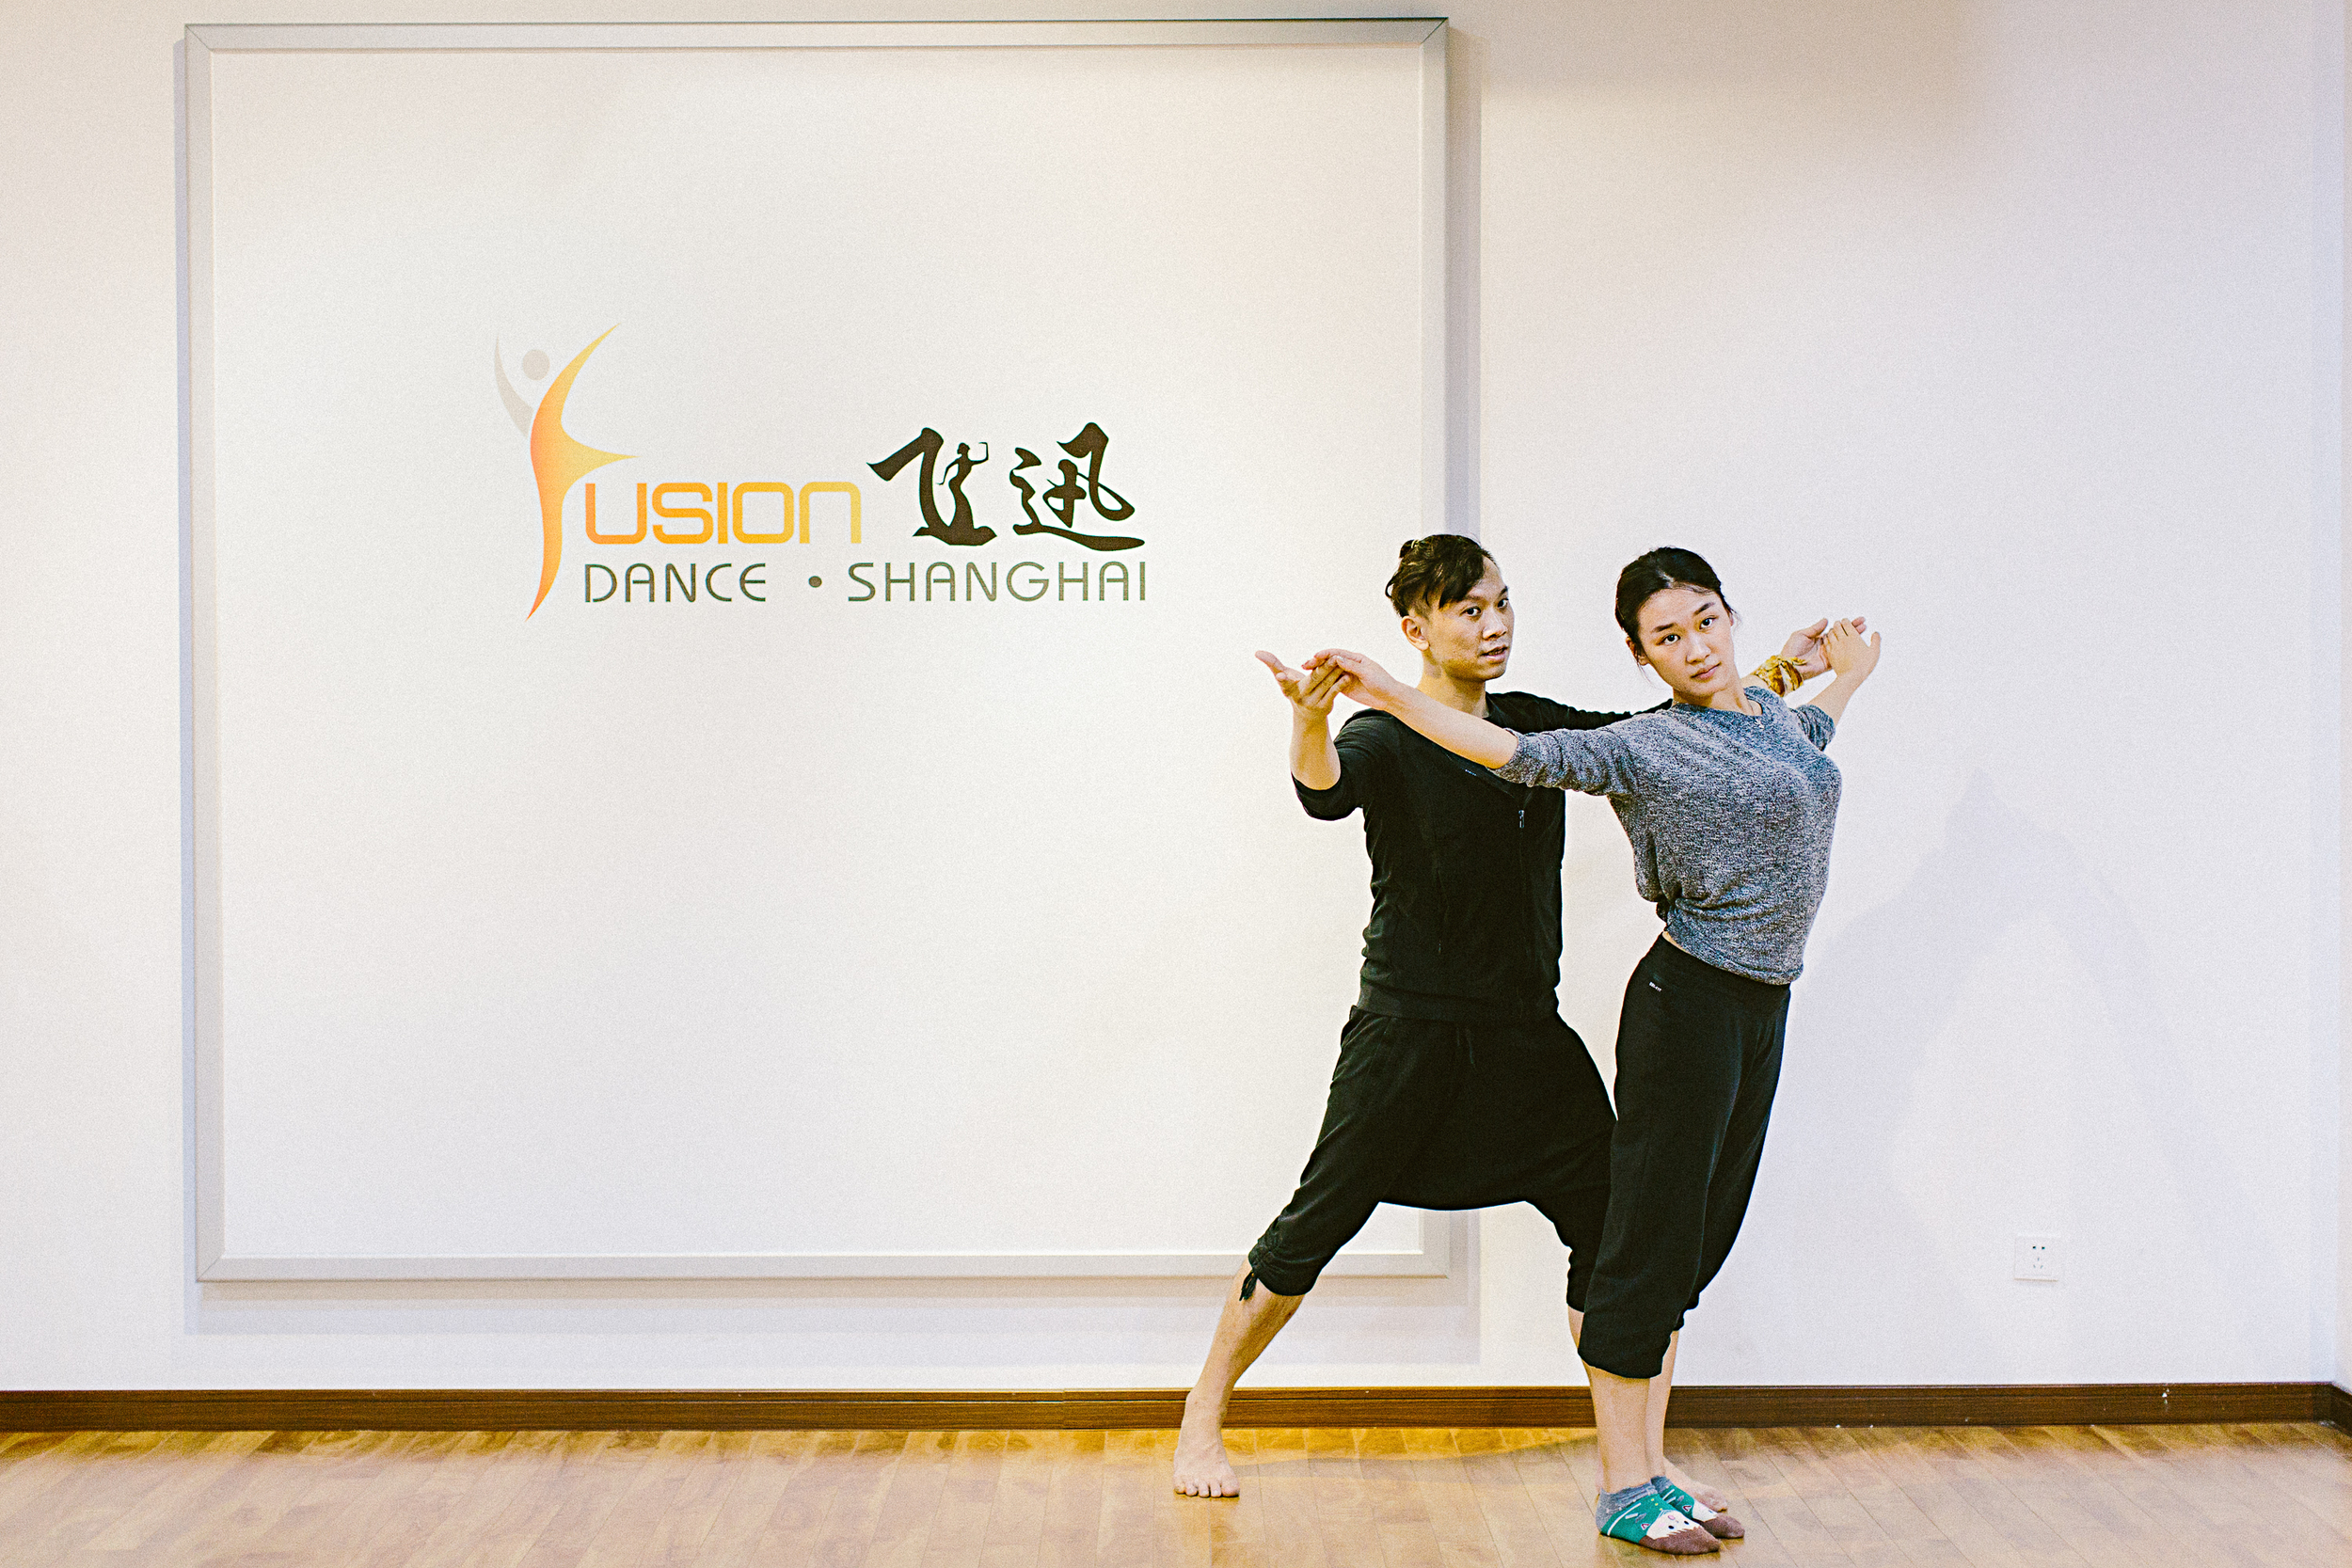 fusion_shanghai_salsa_behindthescenes_jkblackwell-17.jpg